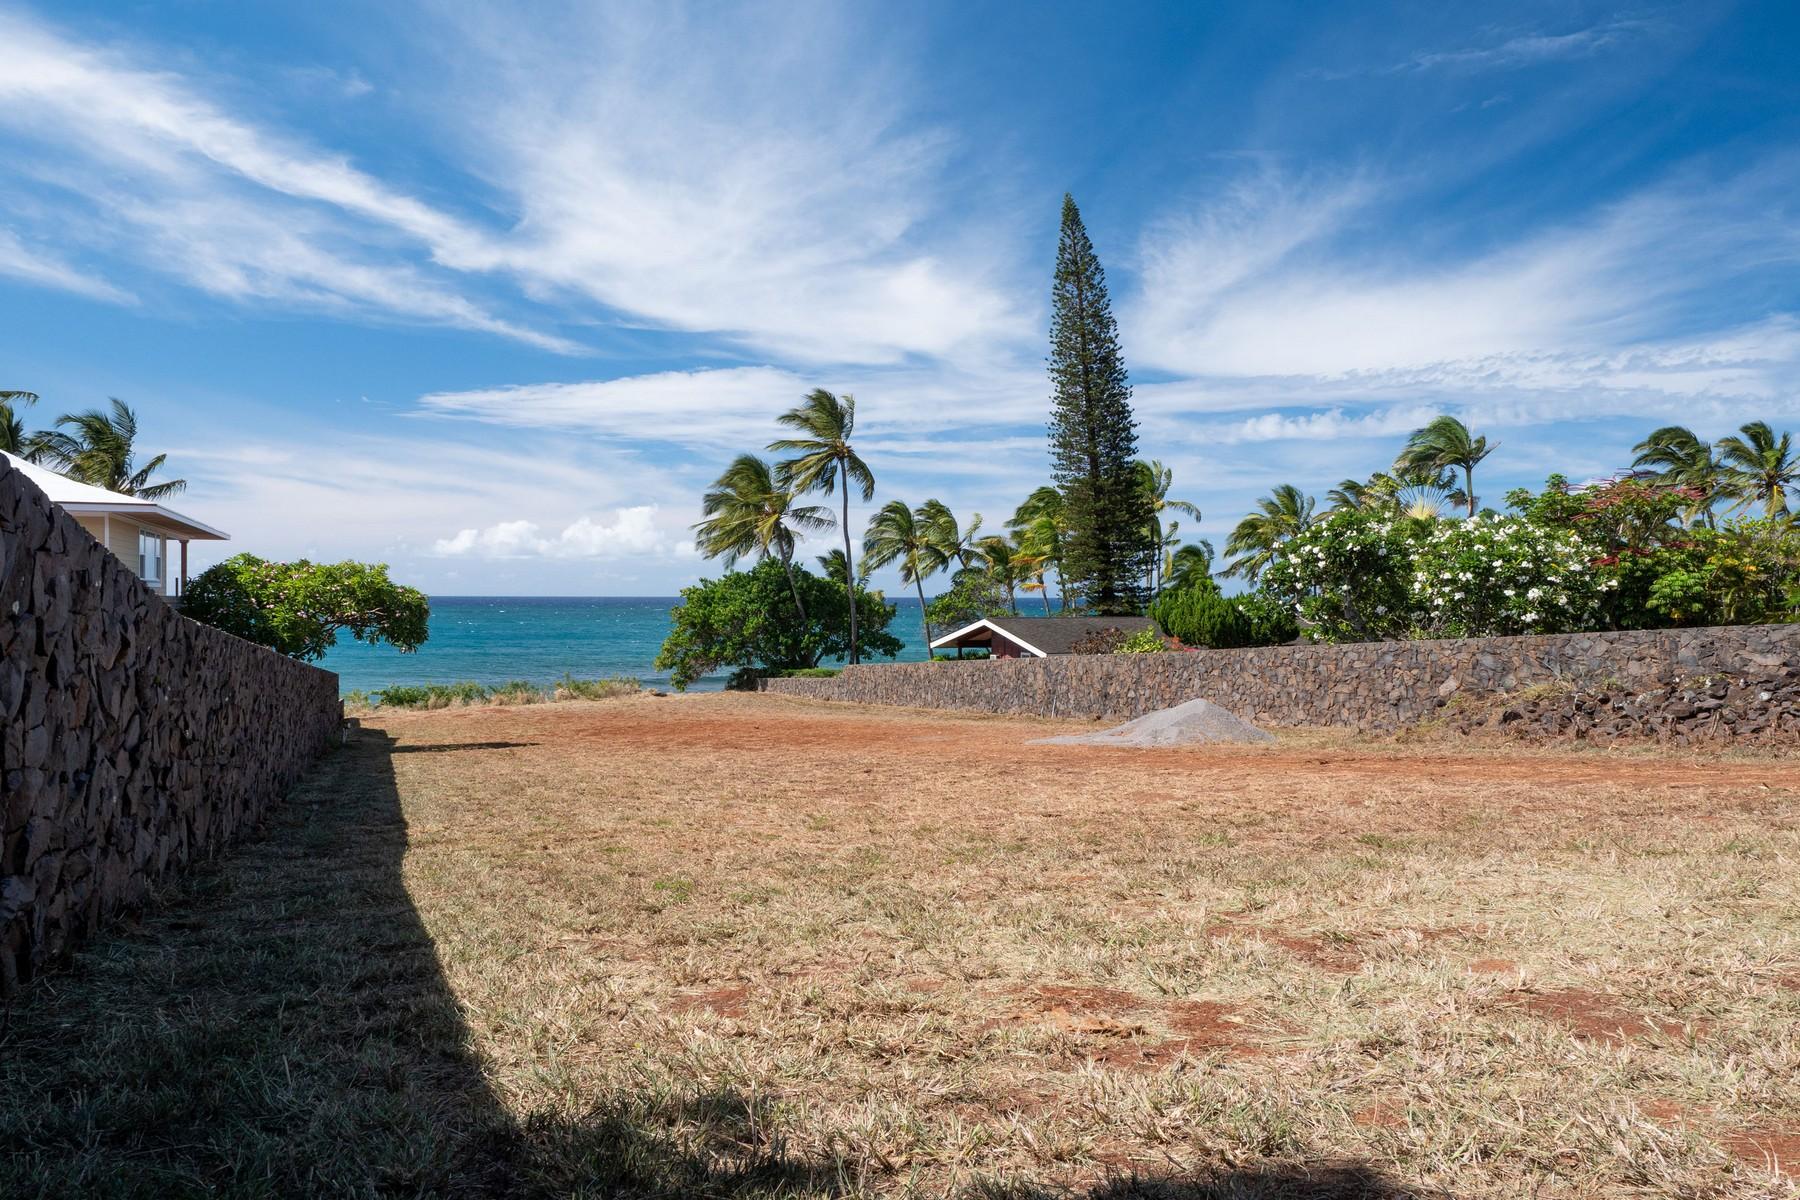 Terreno per Vendita alle ore Epic North Shore Oceanfront Lot 531 Hana Hwy, Paia, Hawaii 96779 Stati Uniti